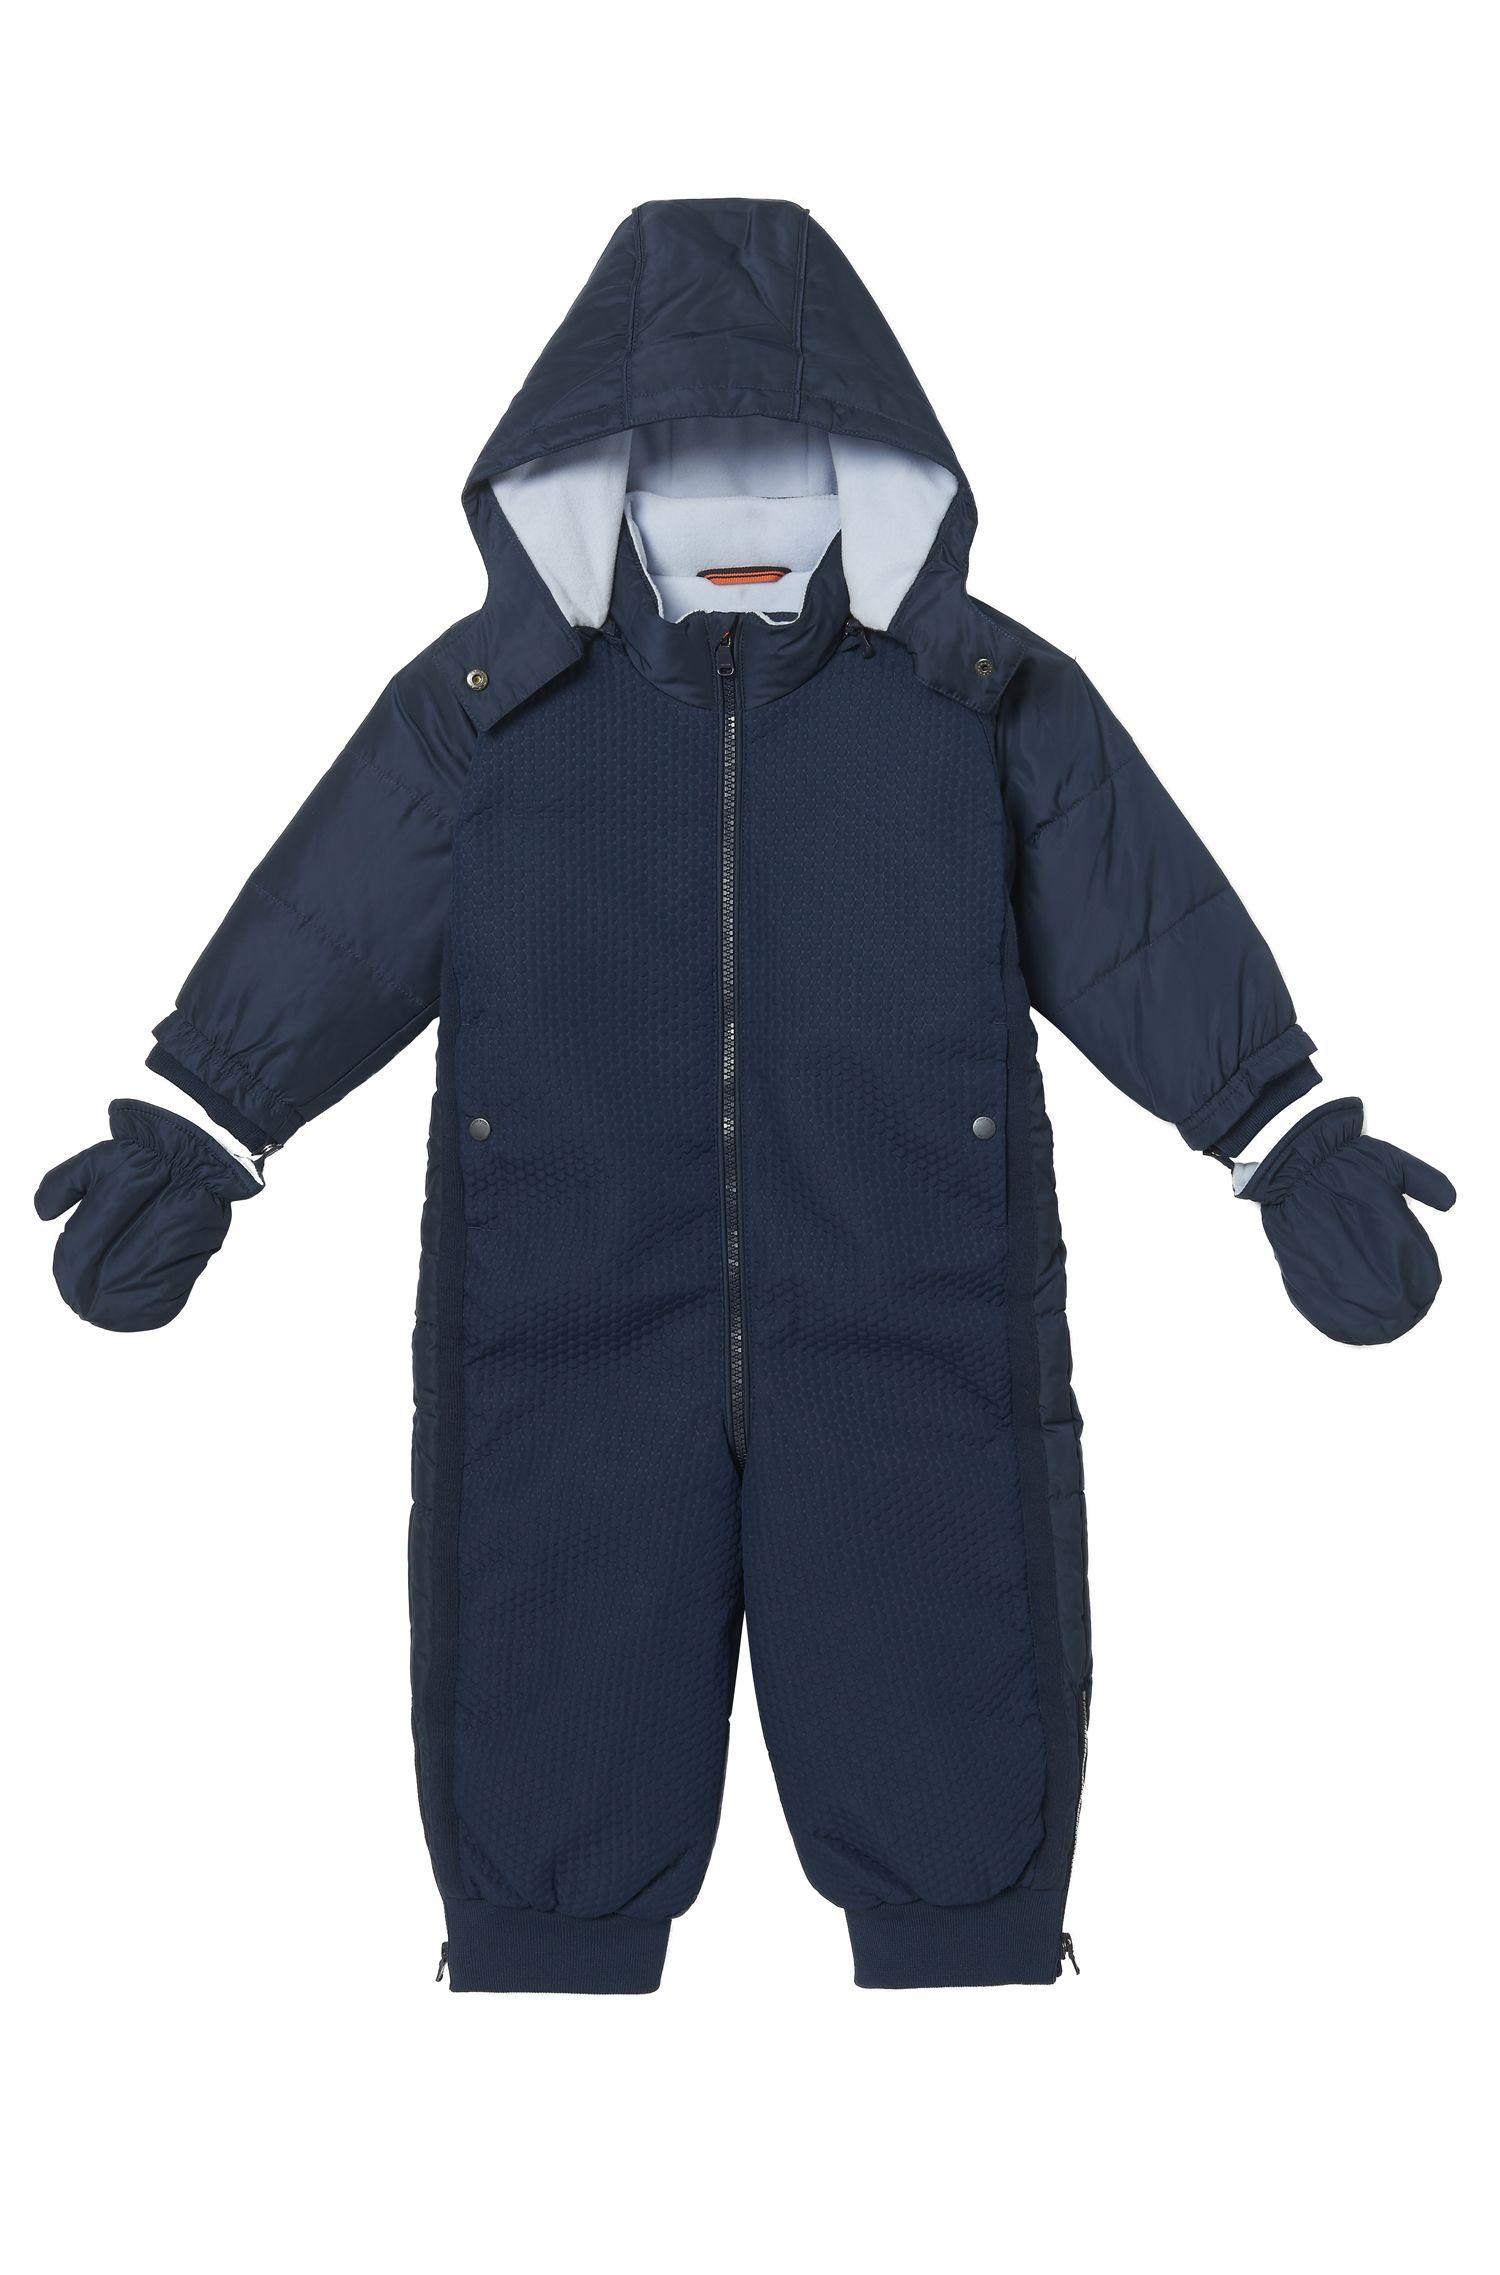 'J06151' | Toddler Nylon Blend Snowsuit, Detachable Hood